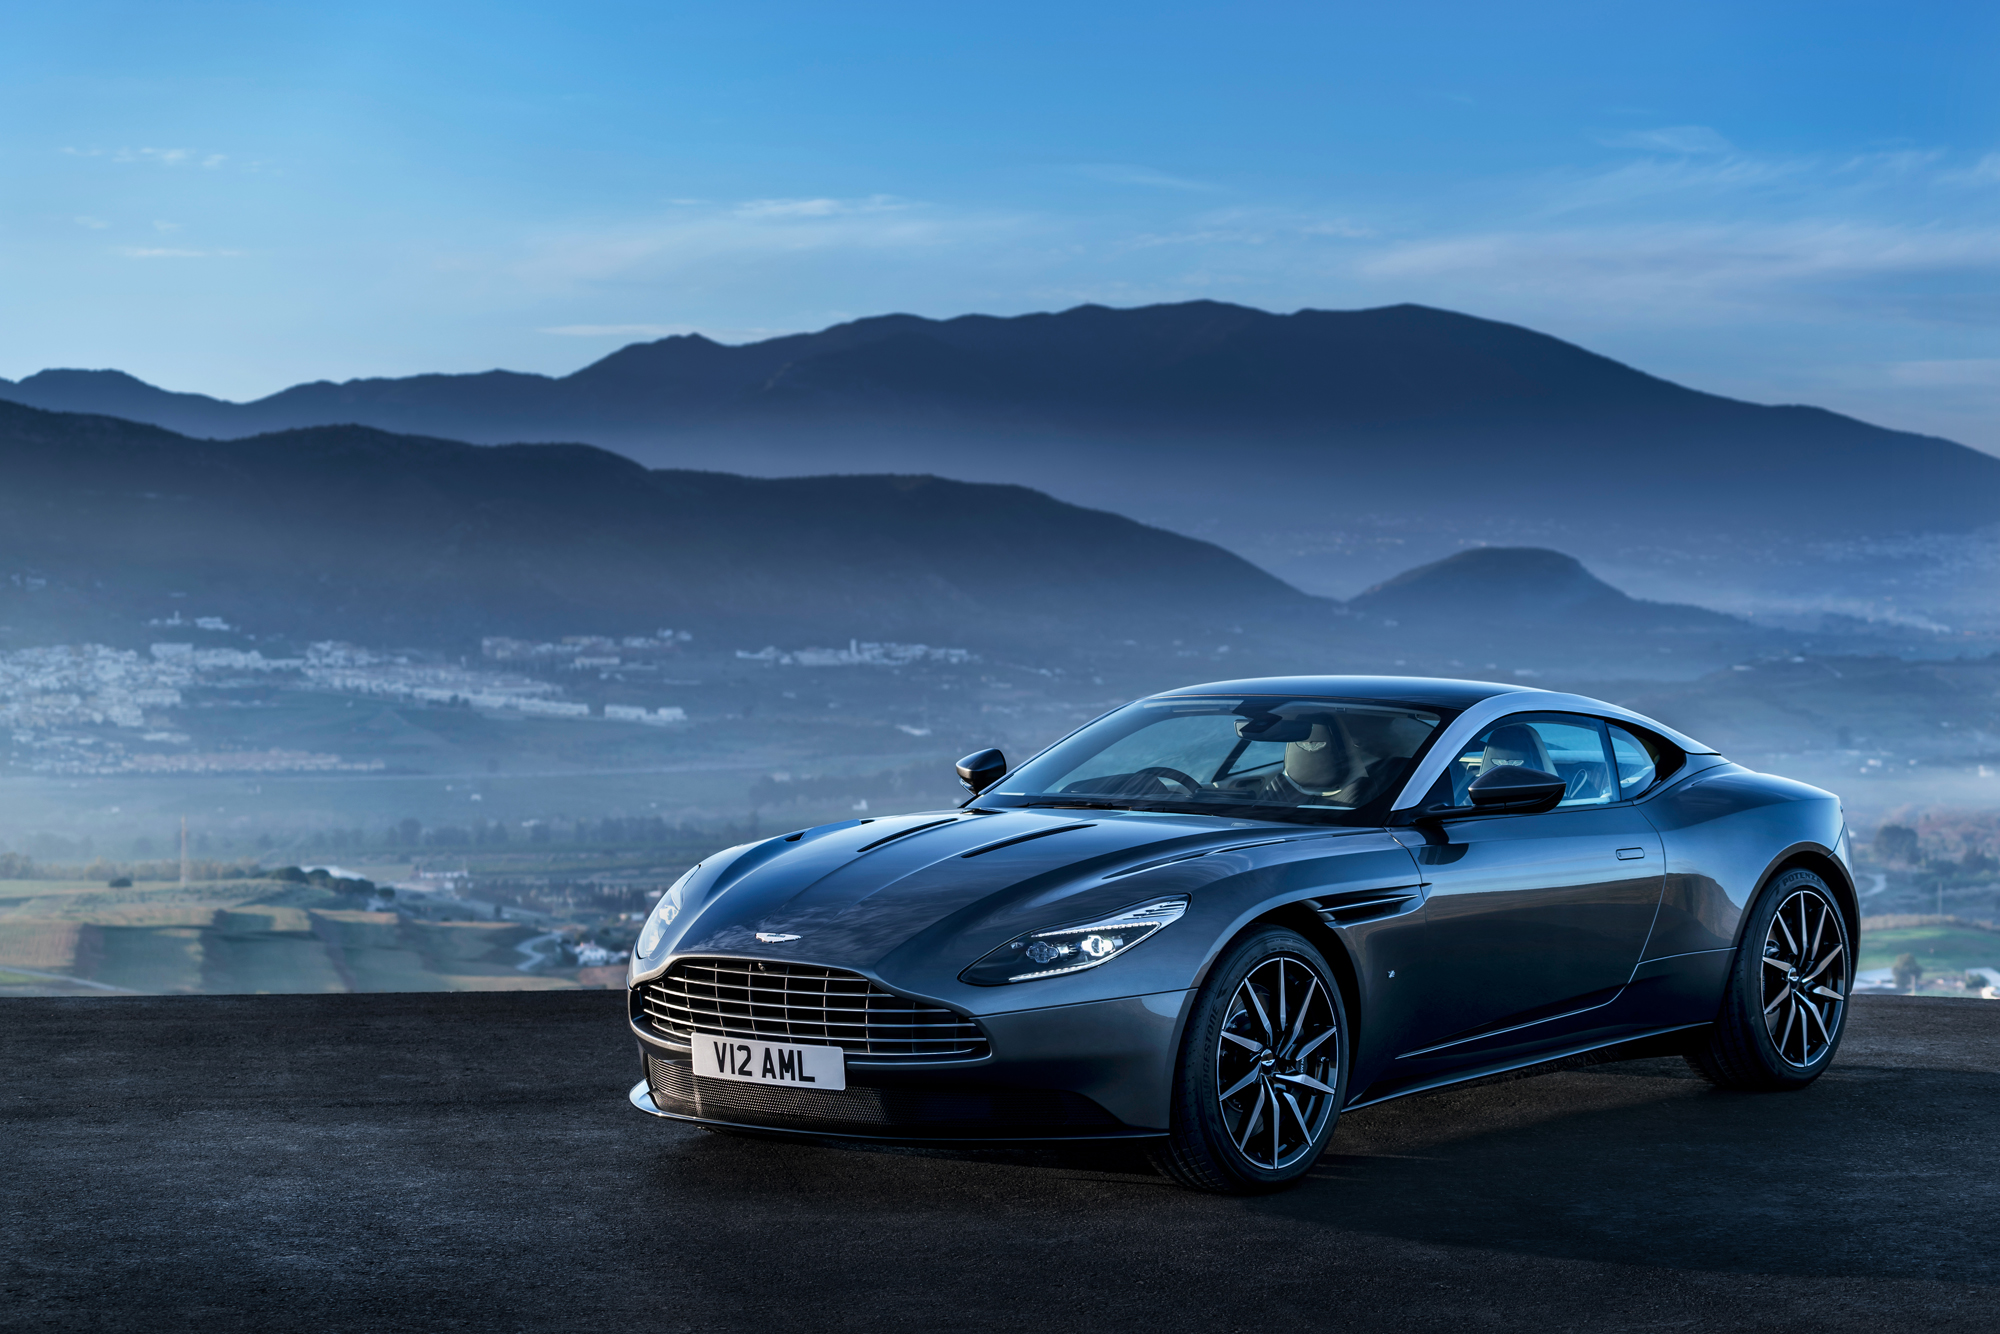 Fotostrecke Aston Martin Stattet Db11 Mit V12 Twin Turbo Aus Sportscar Info De